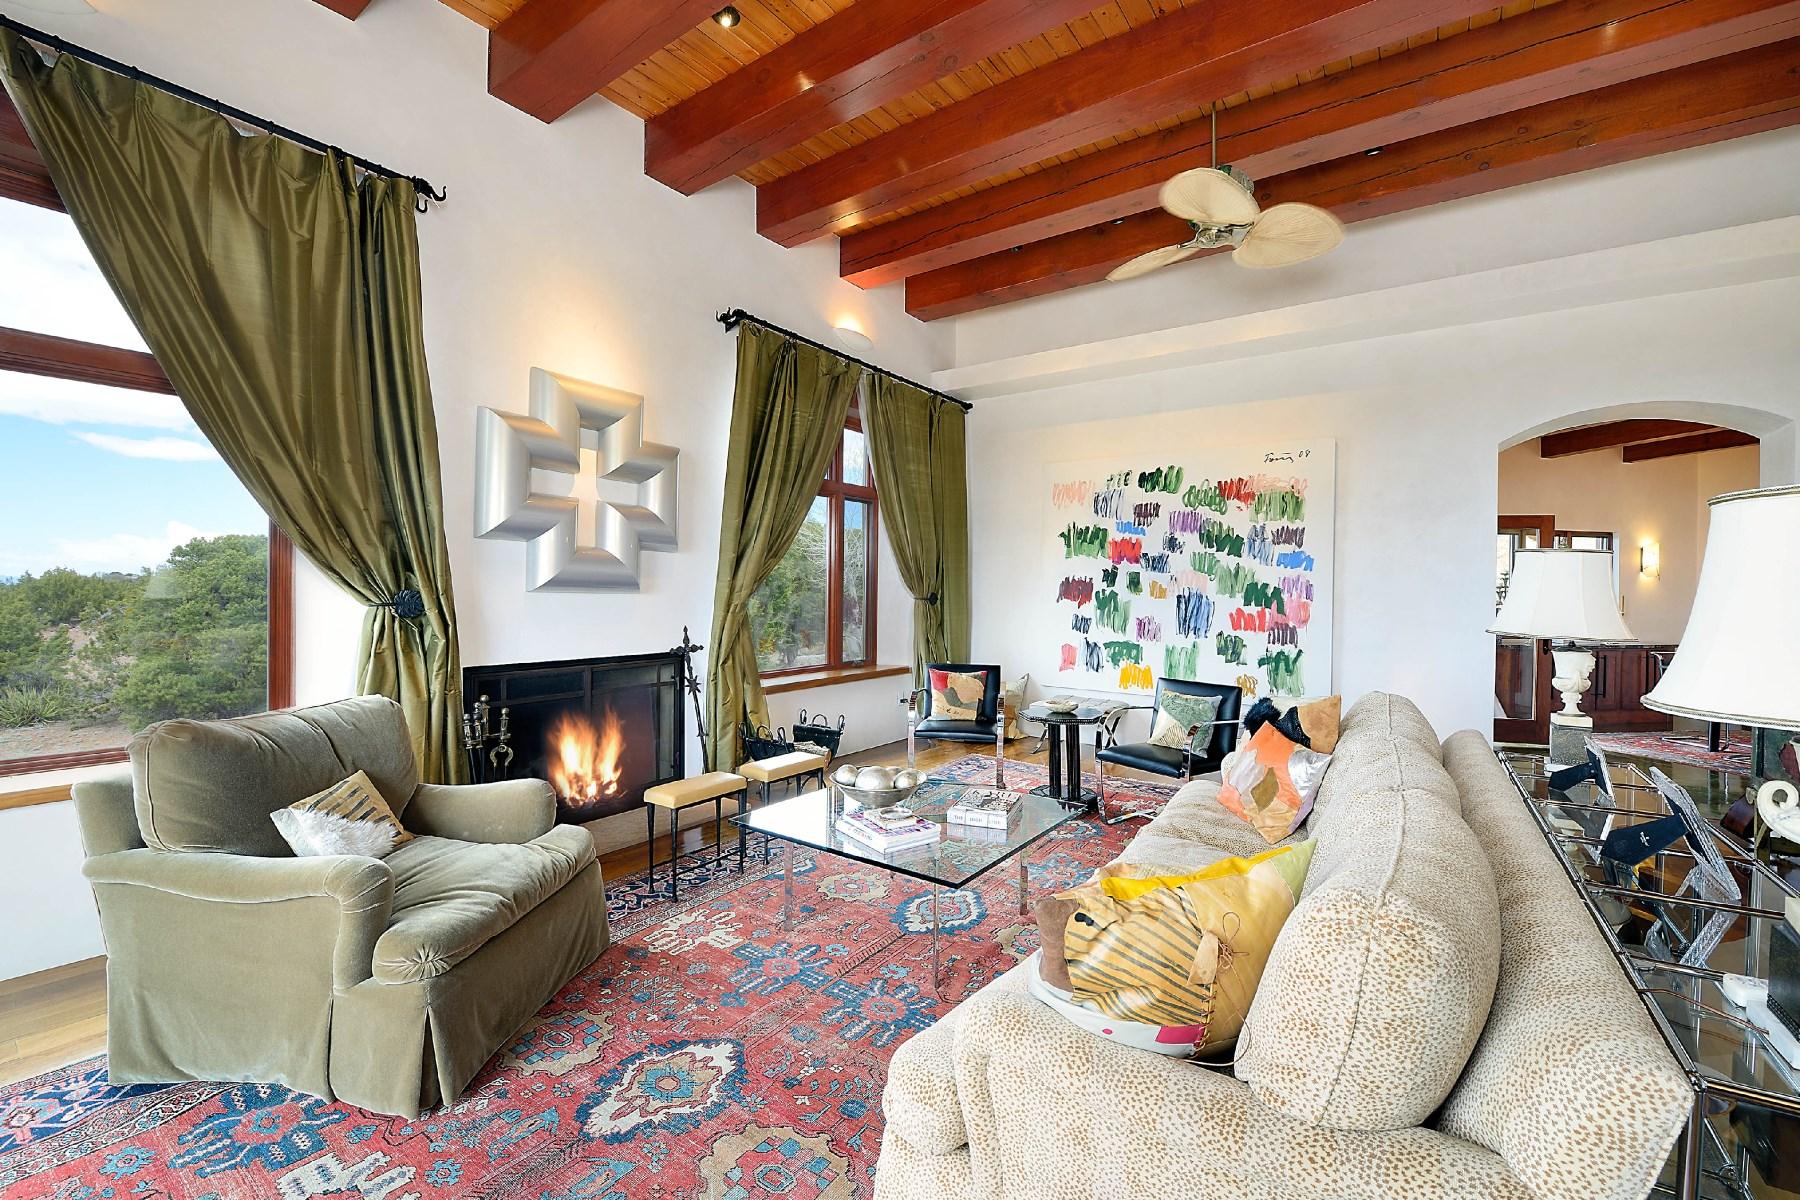 Single Family Home for Sale at 7317-C Old Santa Fe Trail Santa Fe, New Mexico, 87505 United States